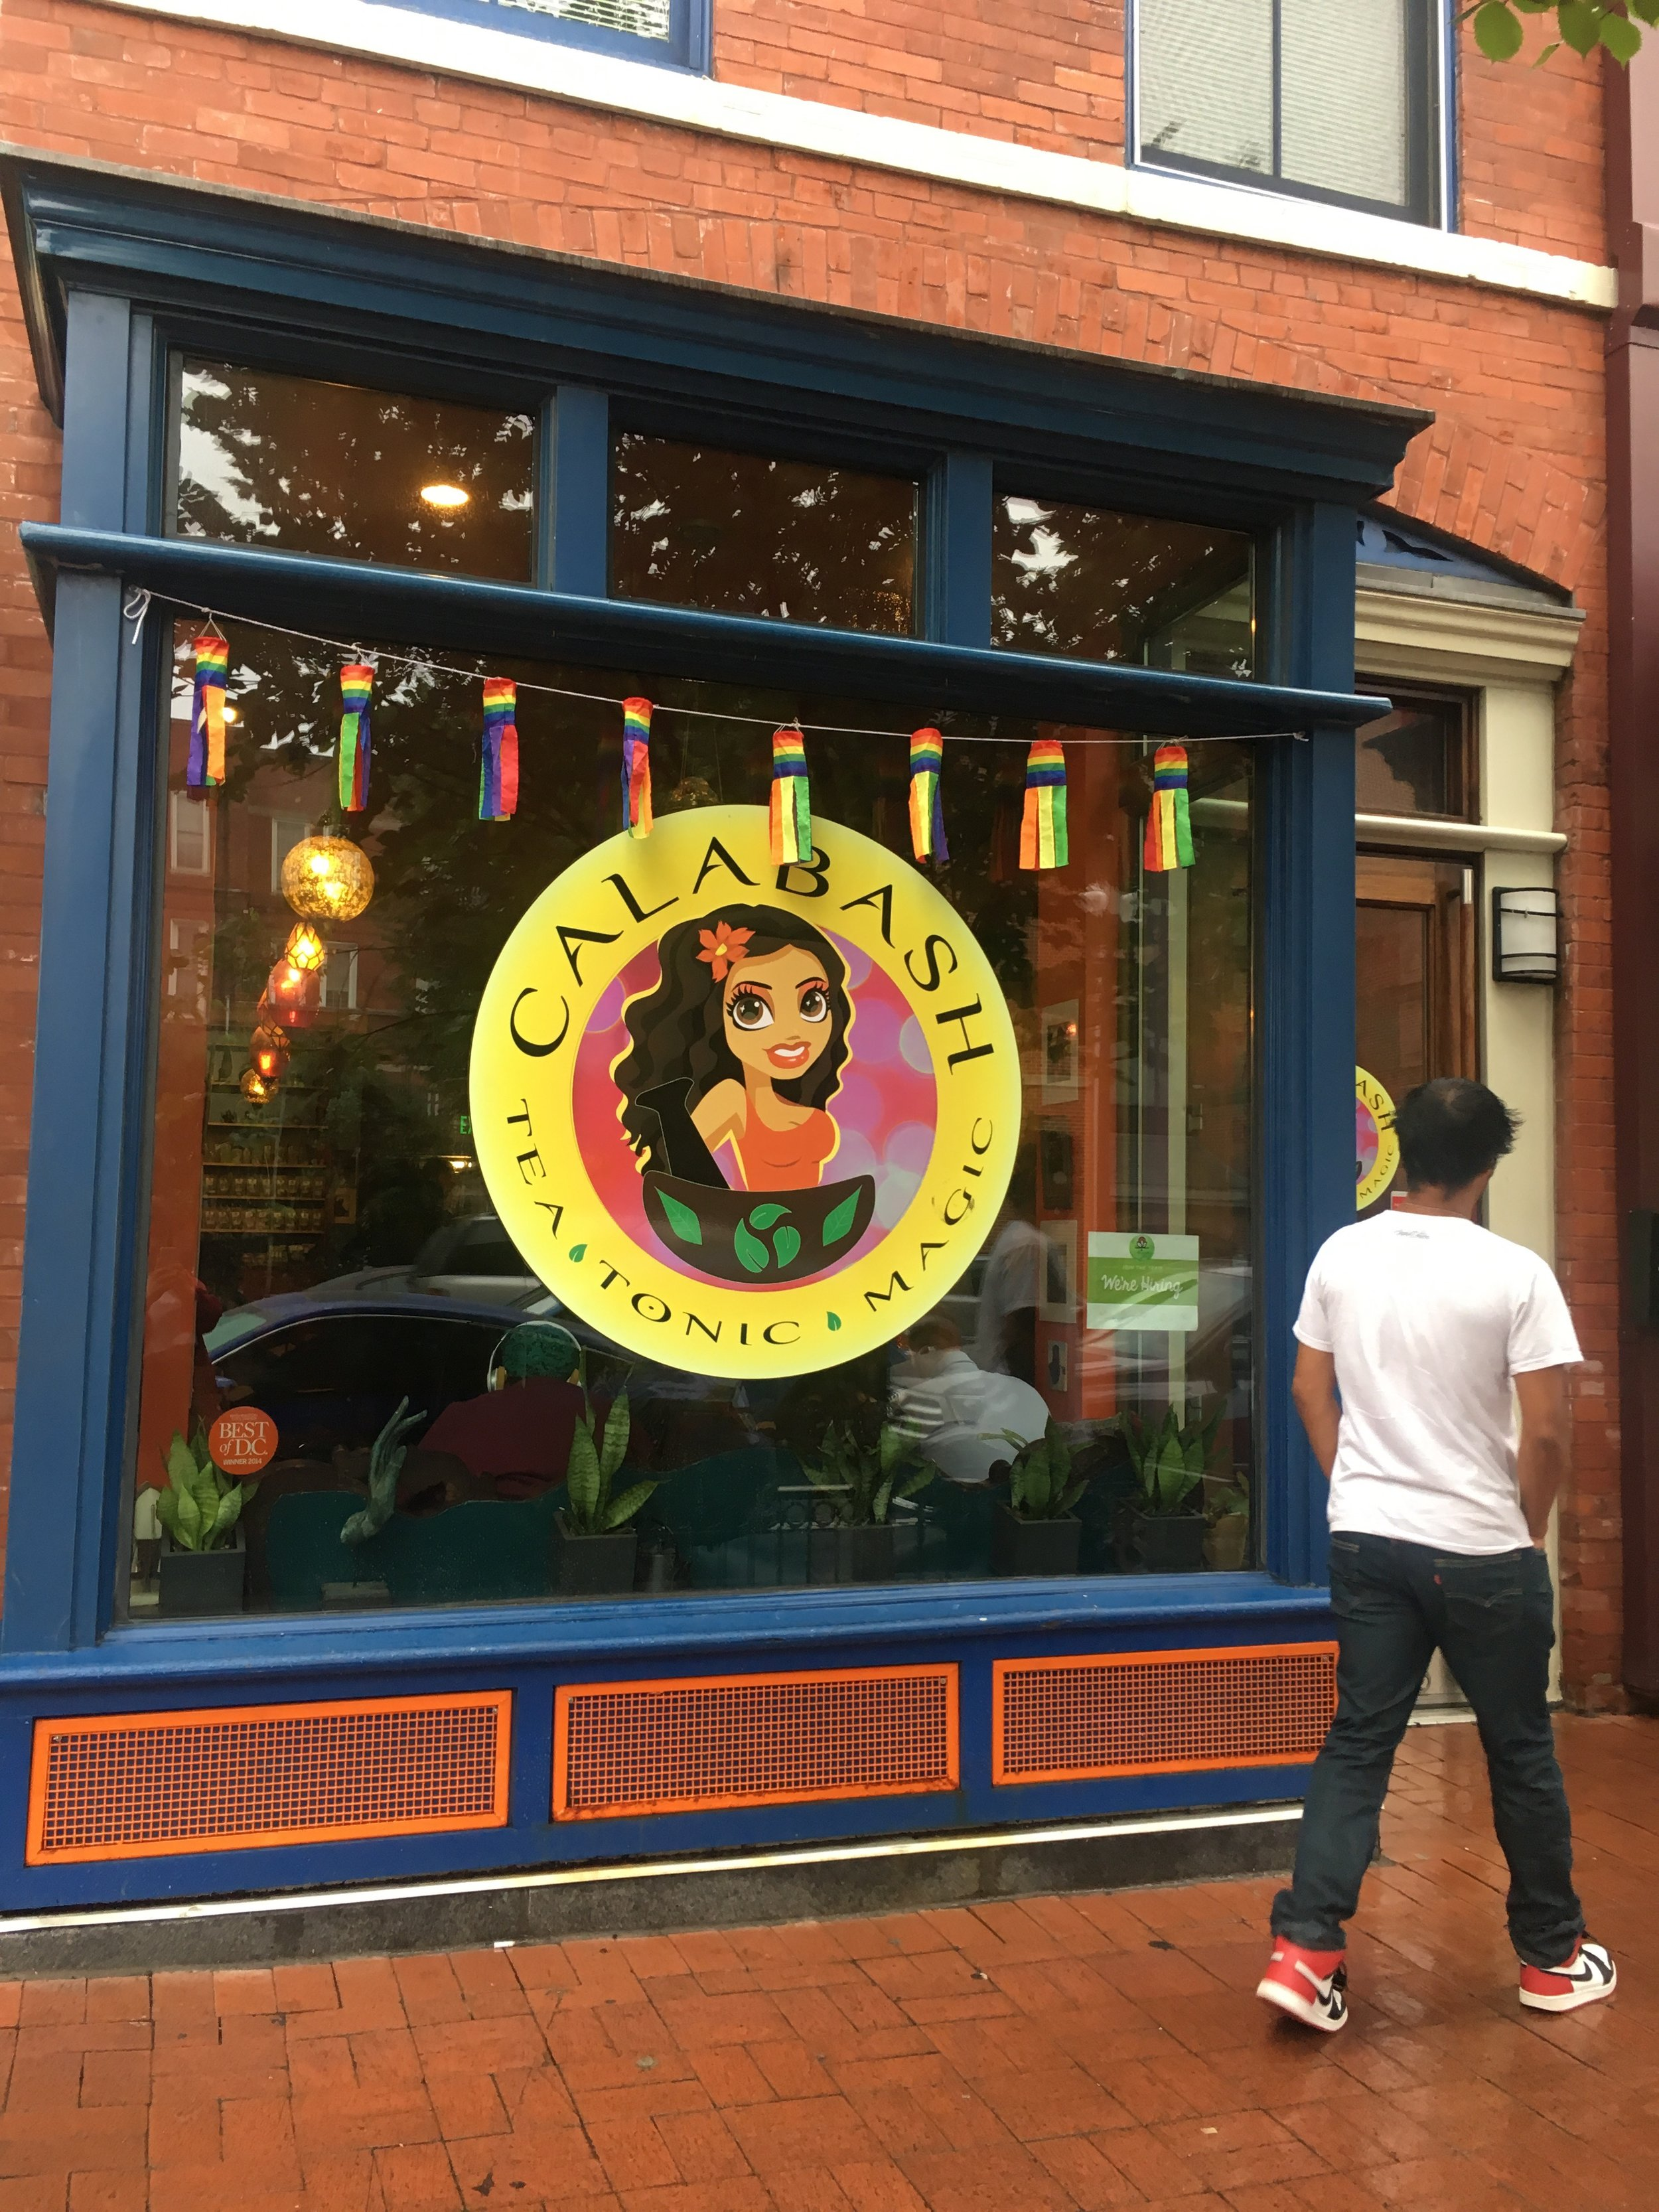 Calabash Tea House, 1847 7th St NW, Washington, DC 20001